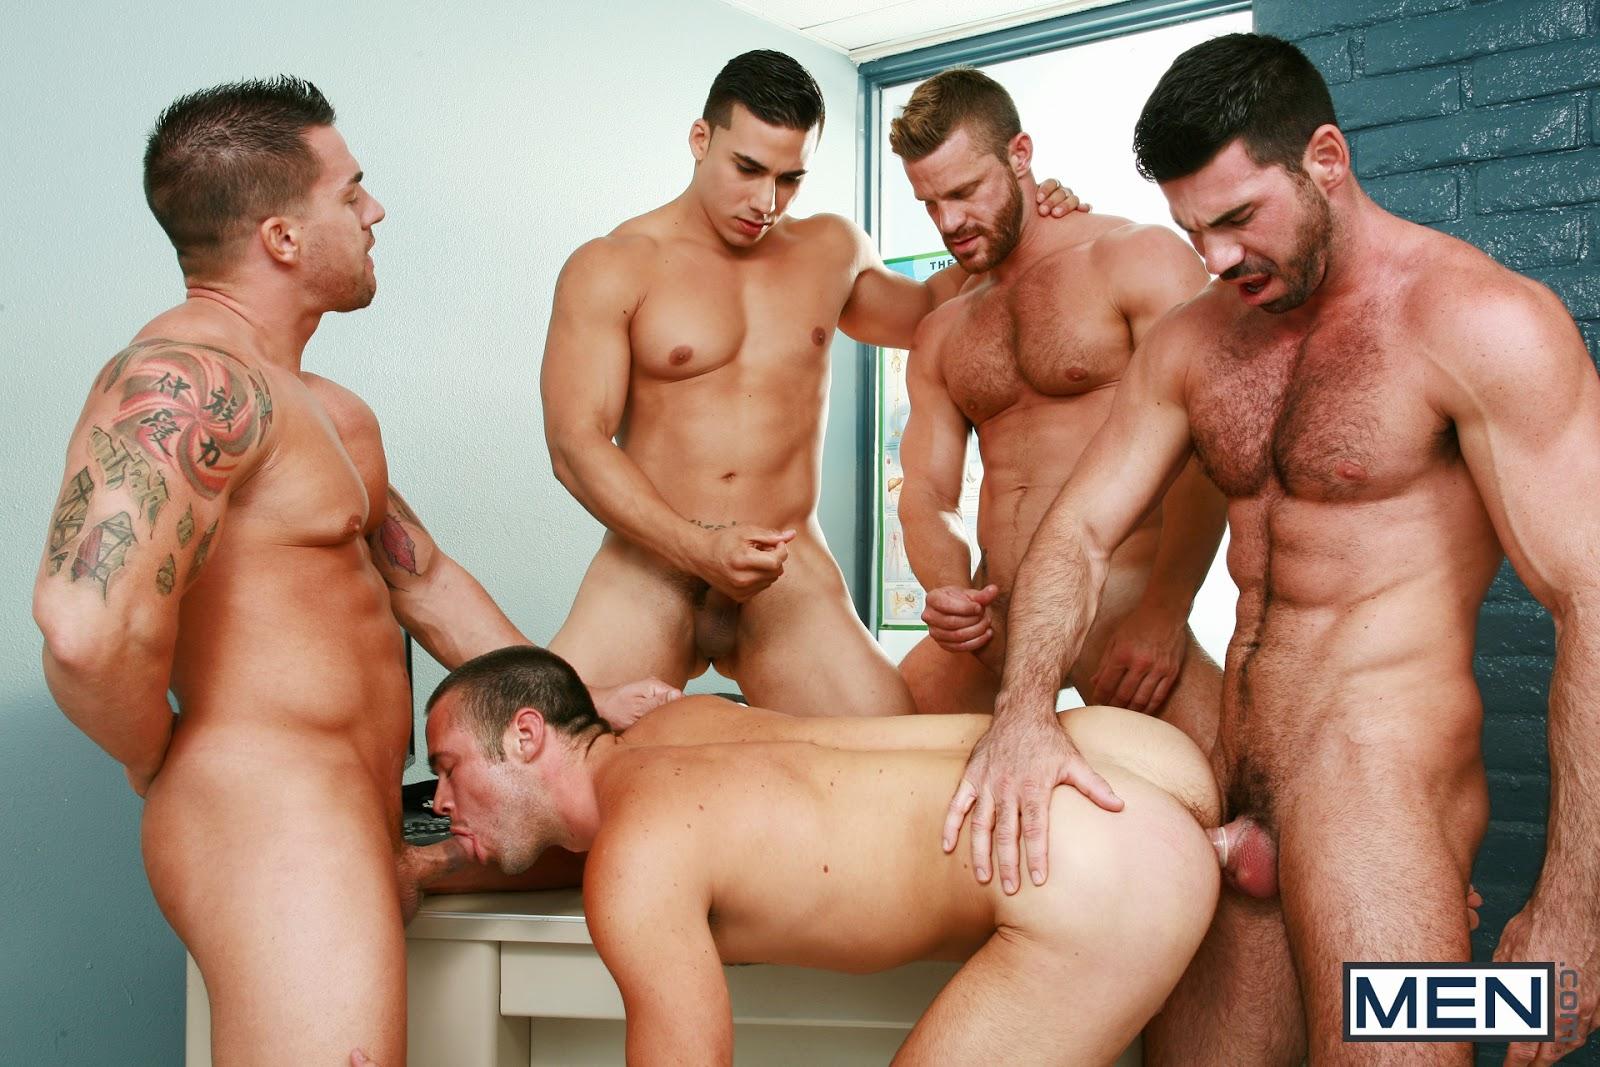 Brian senior men giving head gay first time boys